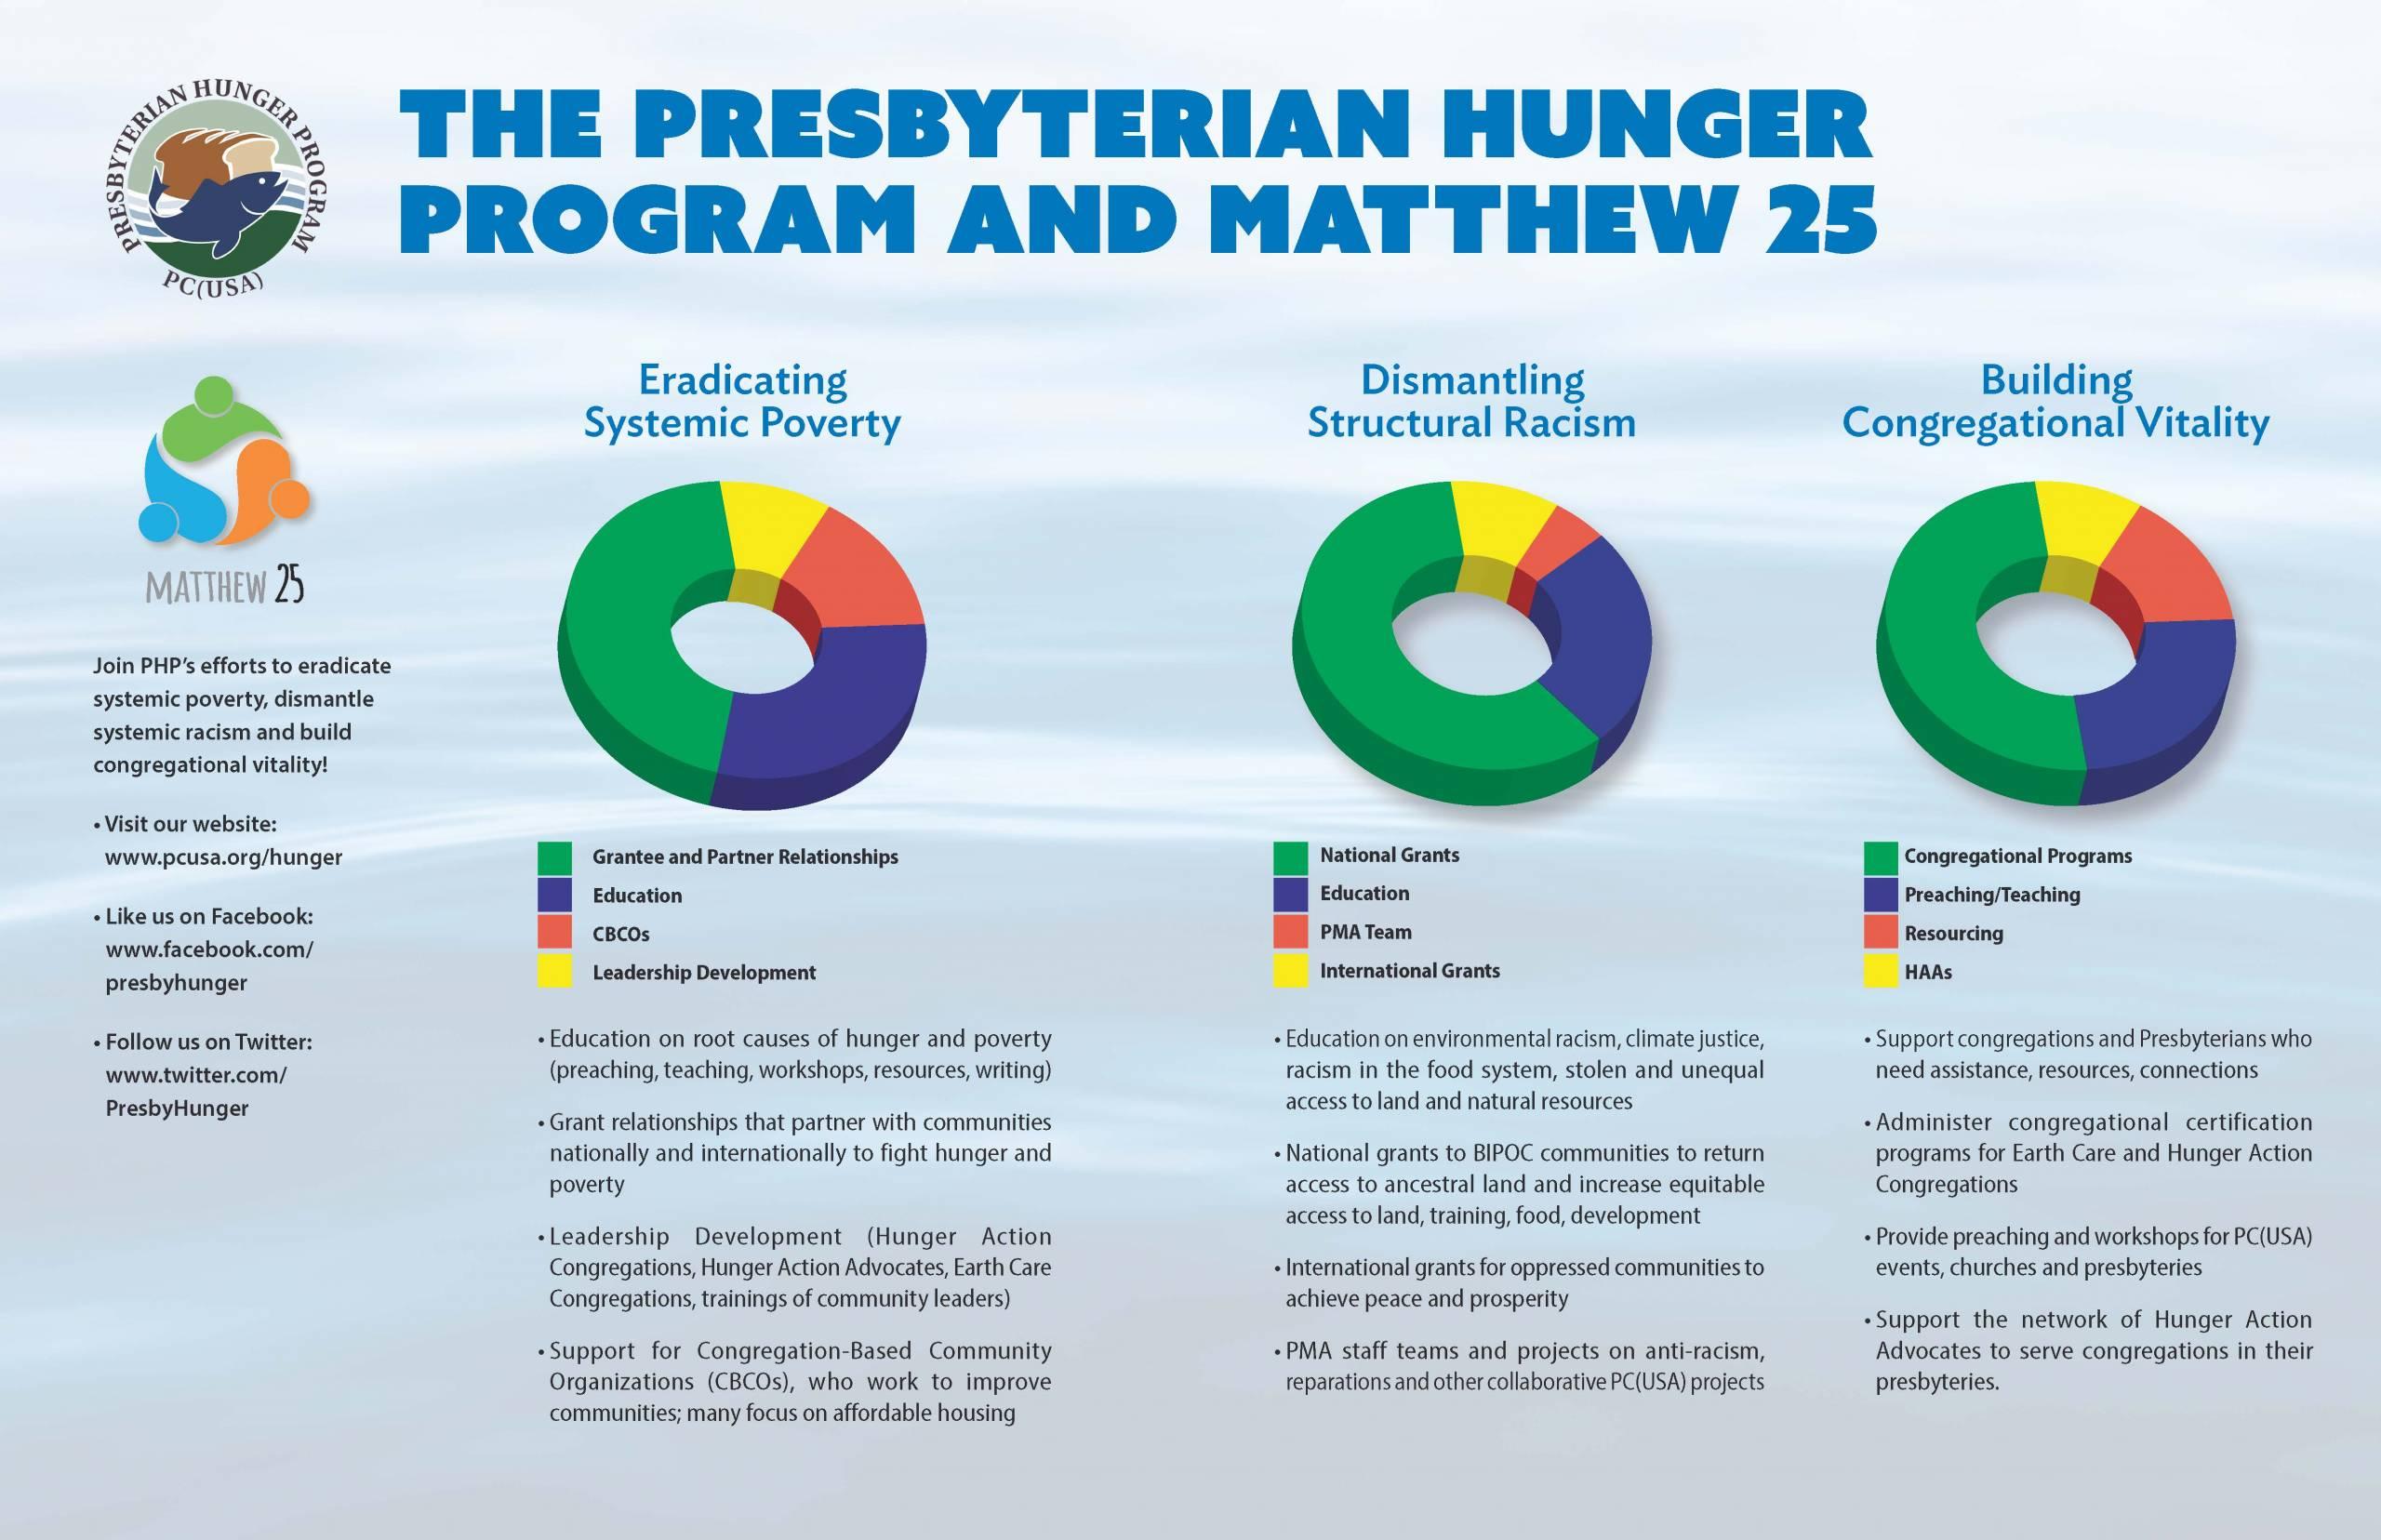 Matthew 25 Poster